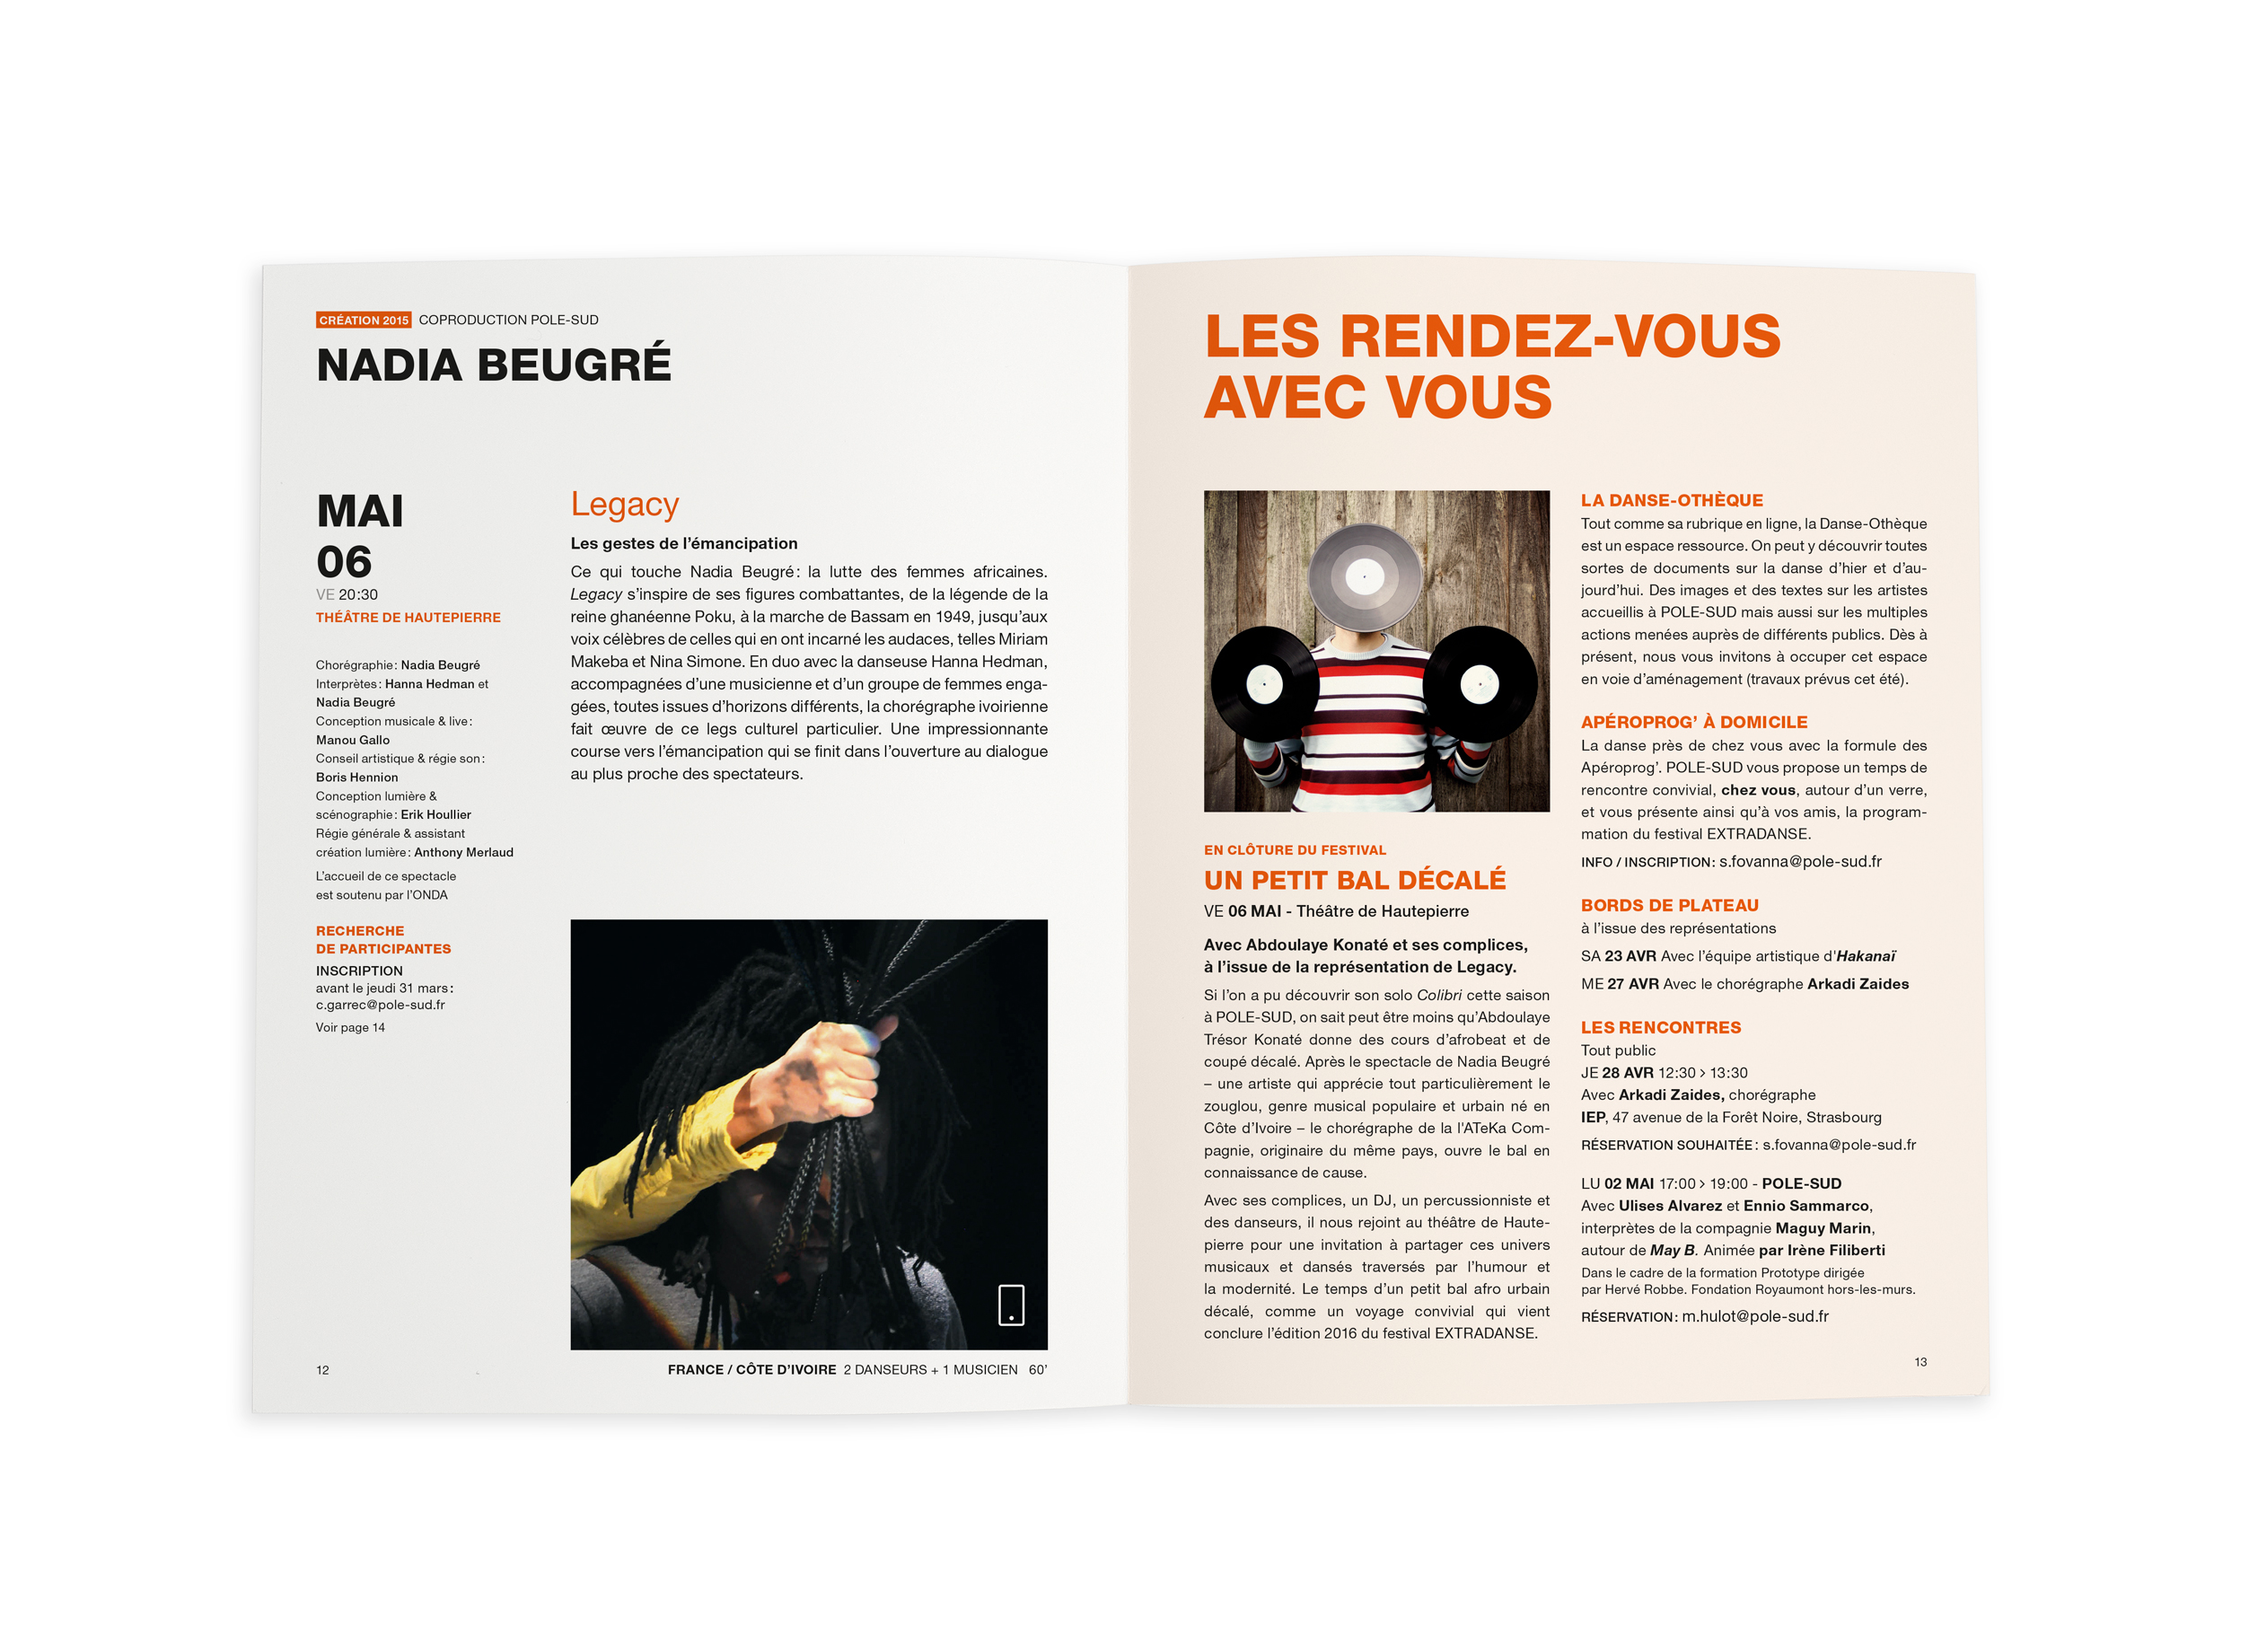 15 16 EXTRADANSE Brochure 06